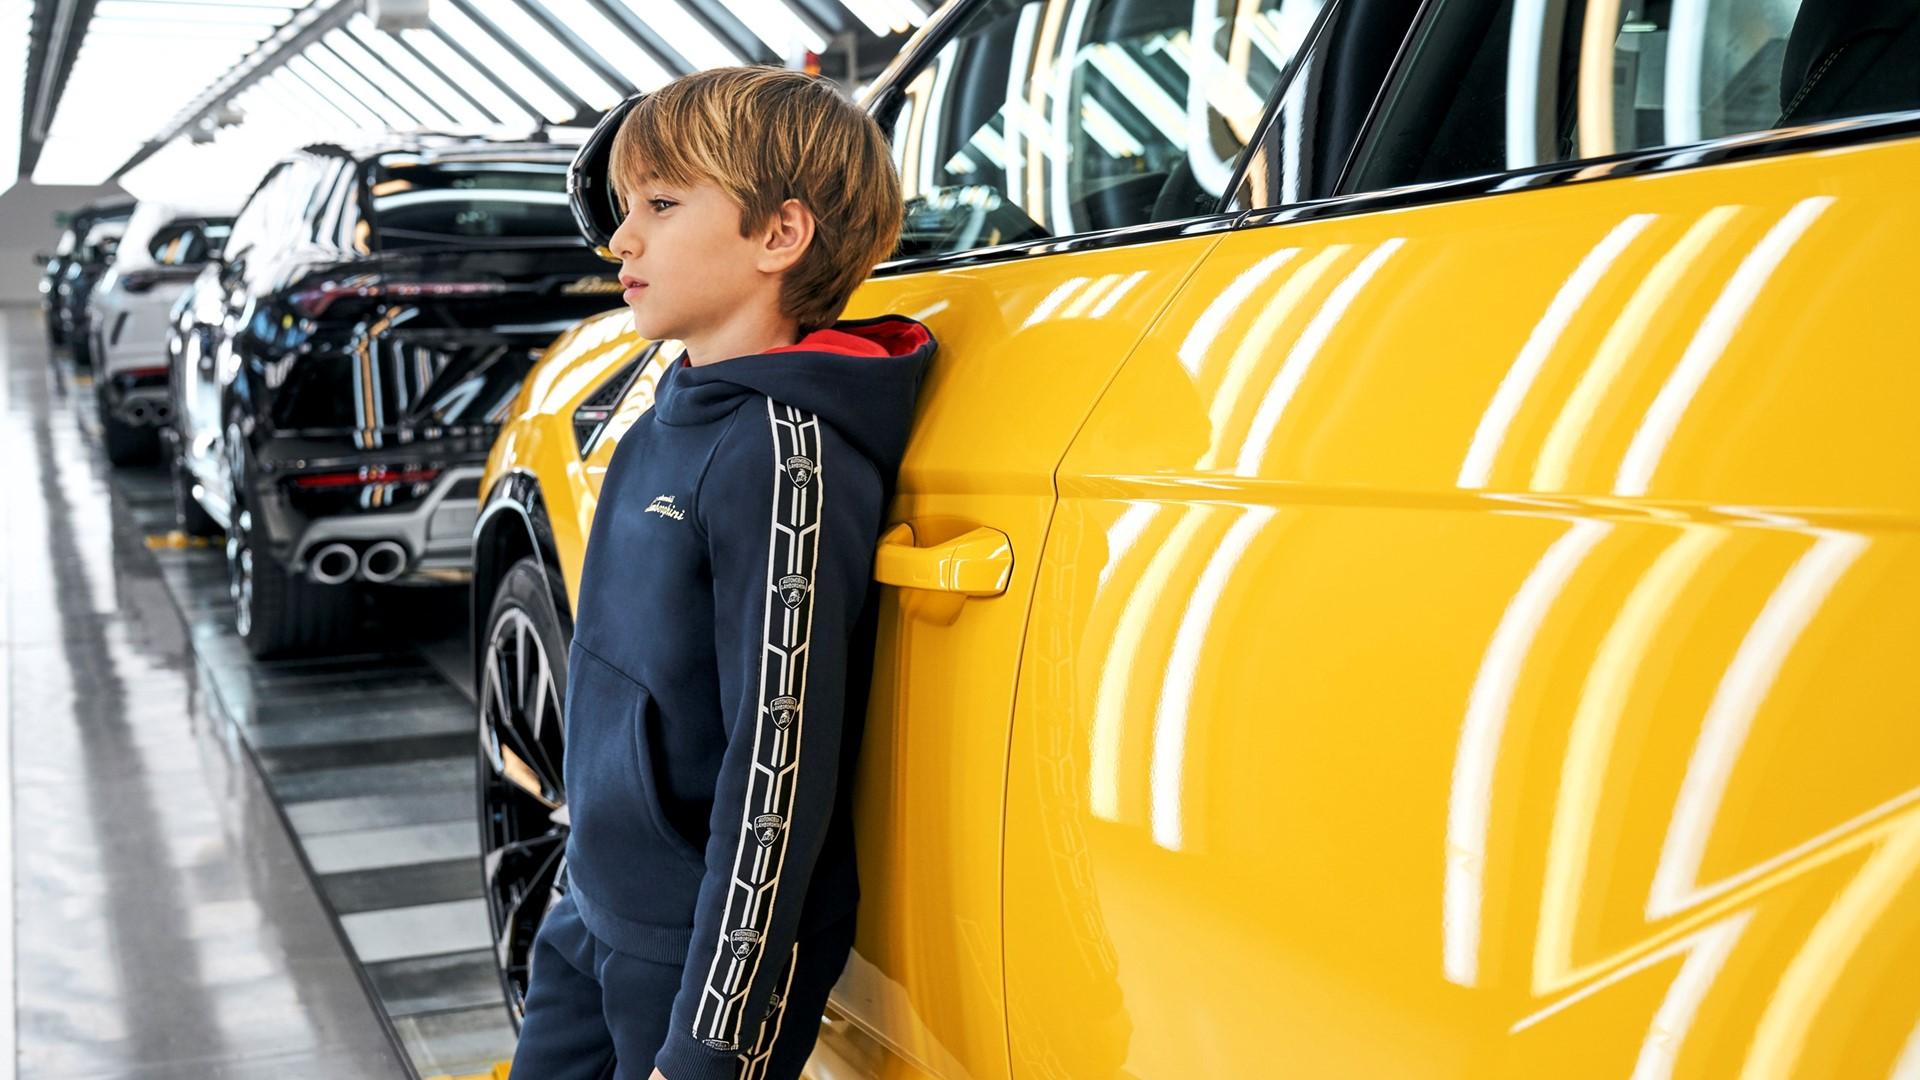 Automobili Lamborghini and KABOOKI confirm kidswear licensing agreement - Image 1